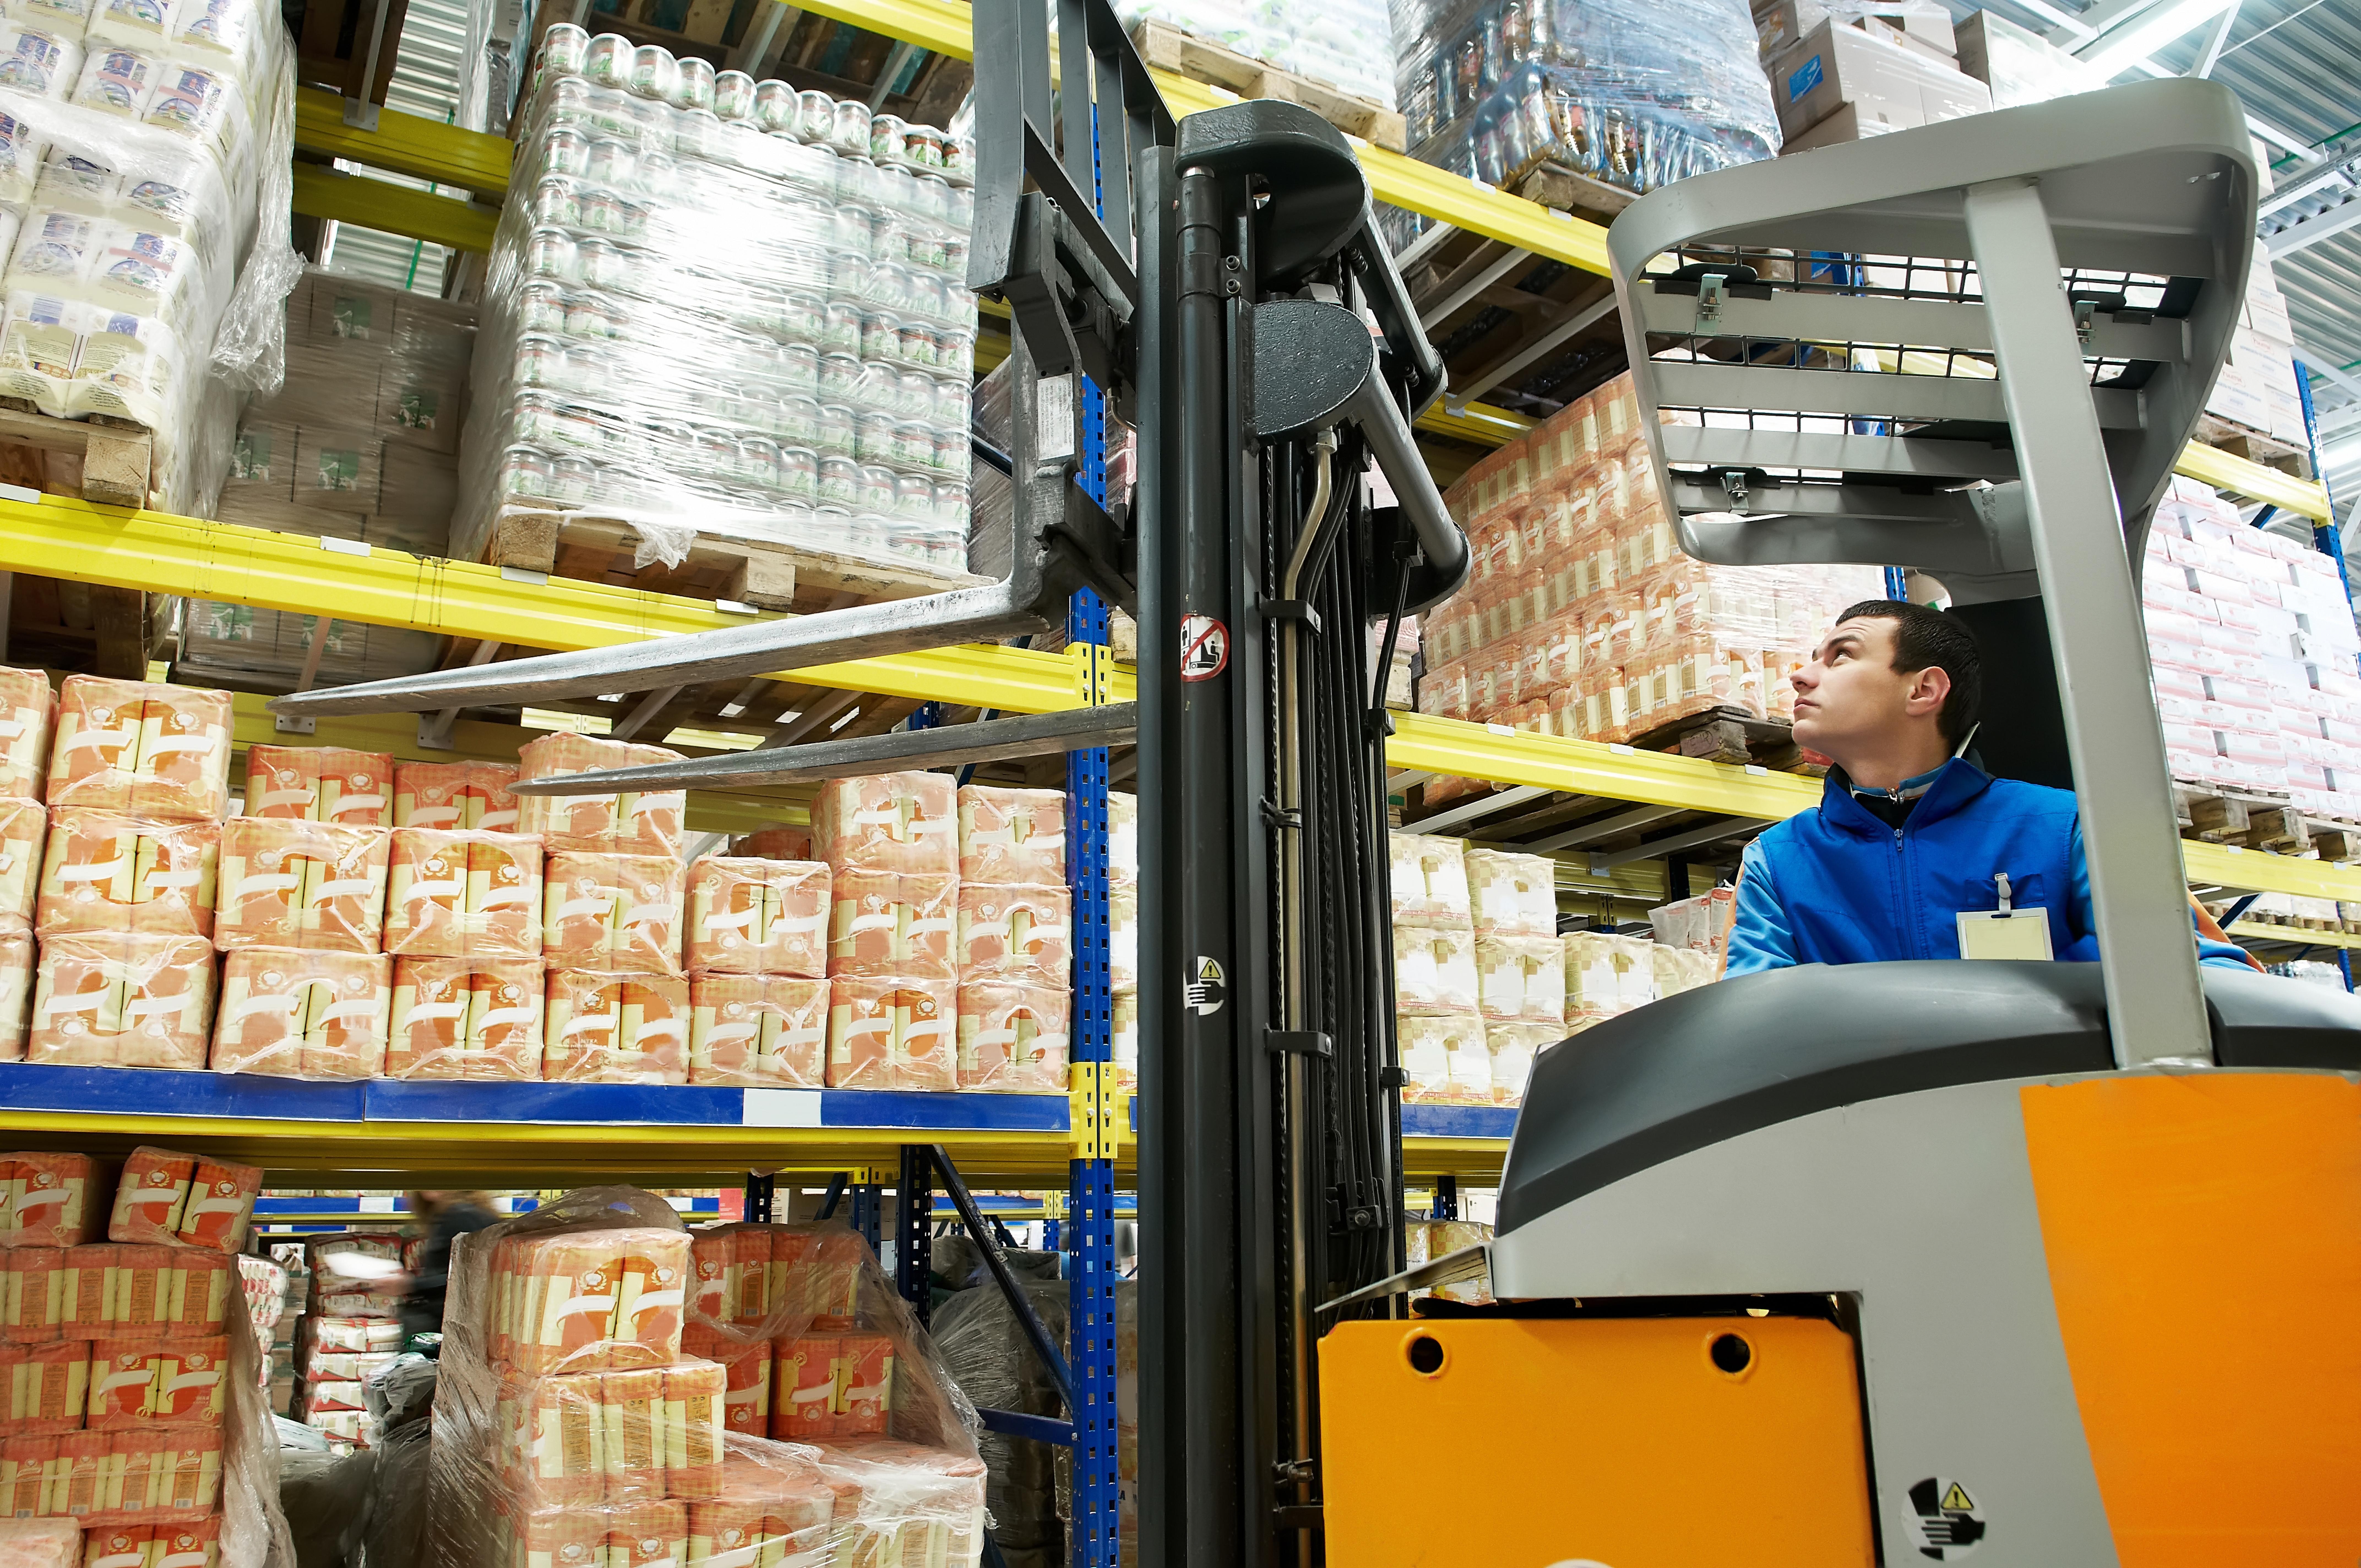 Distributor Management